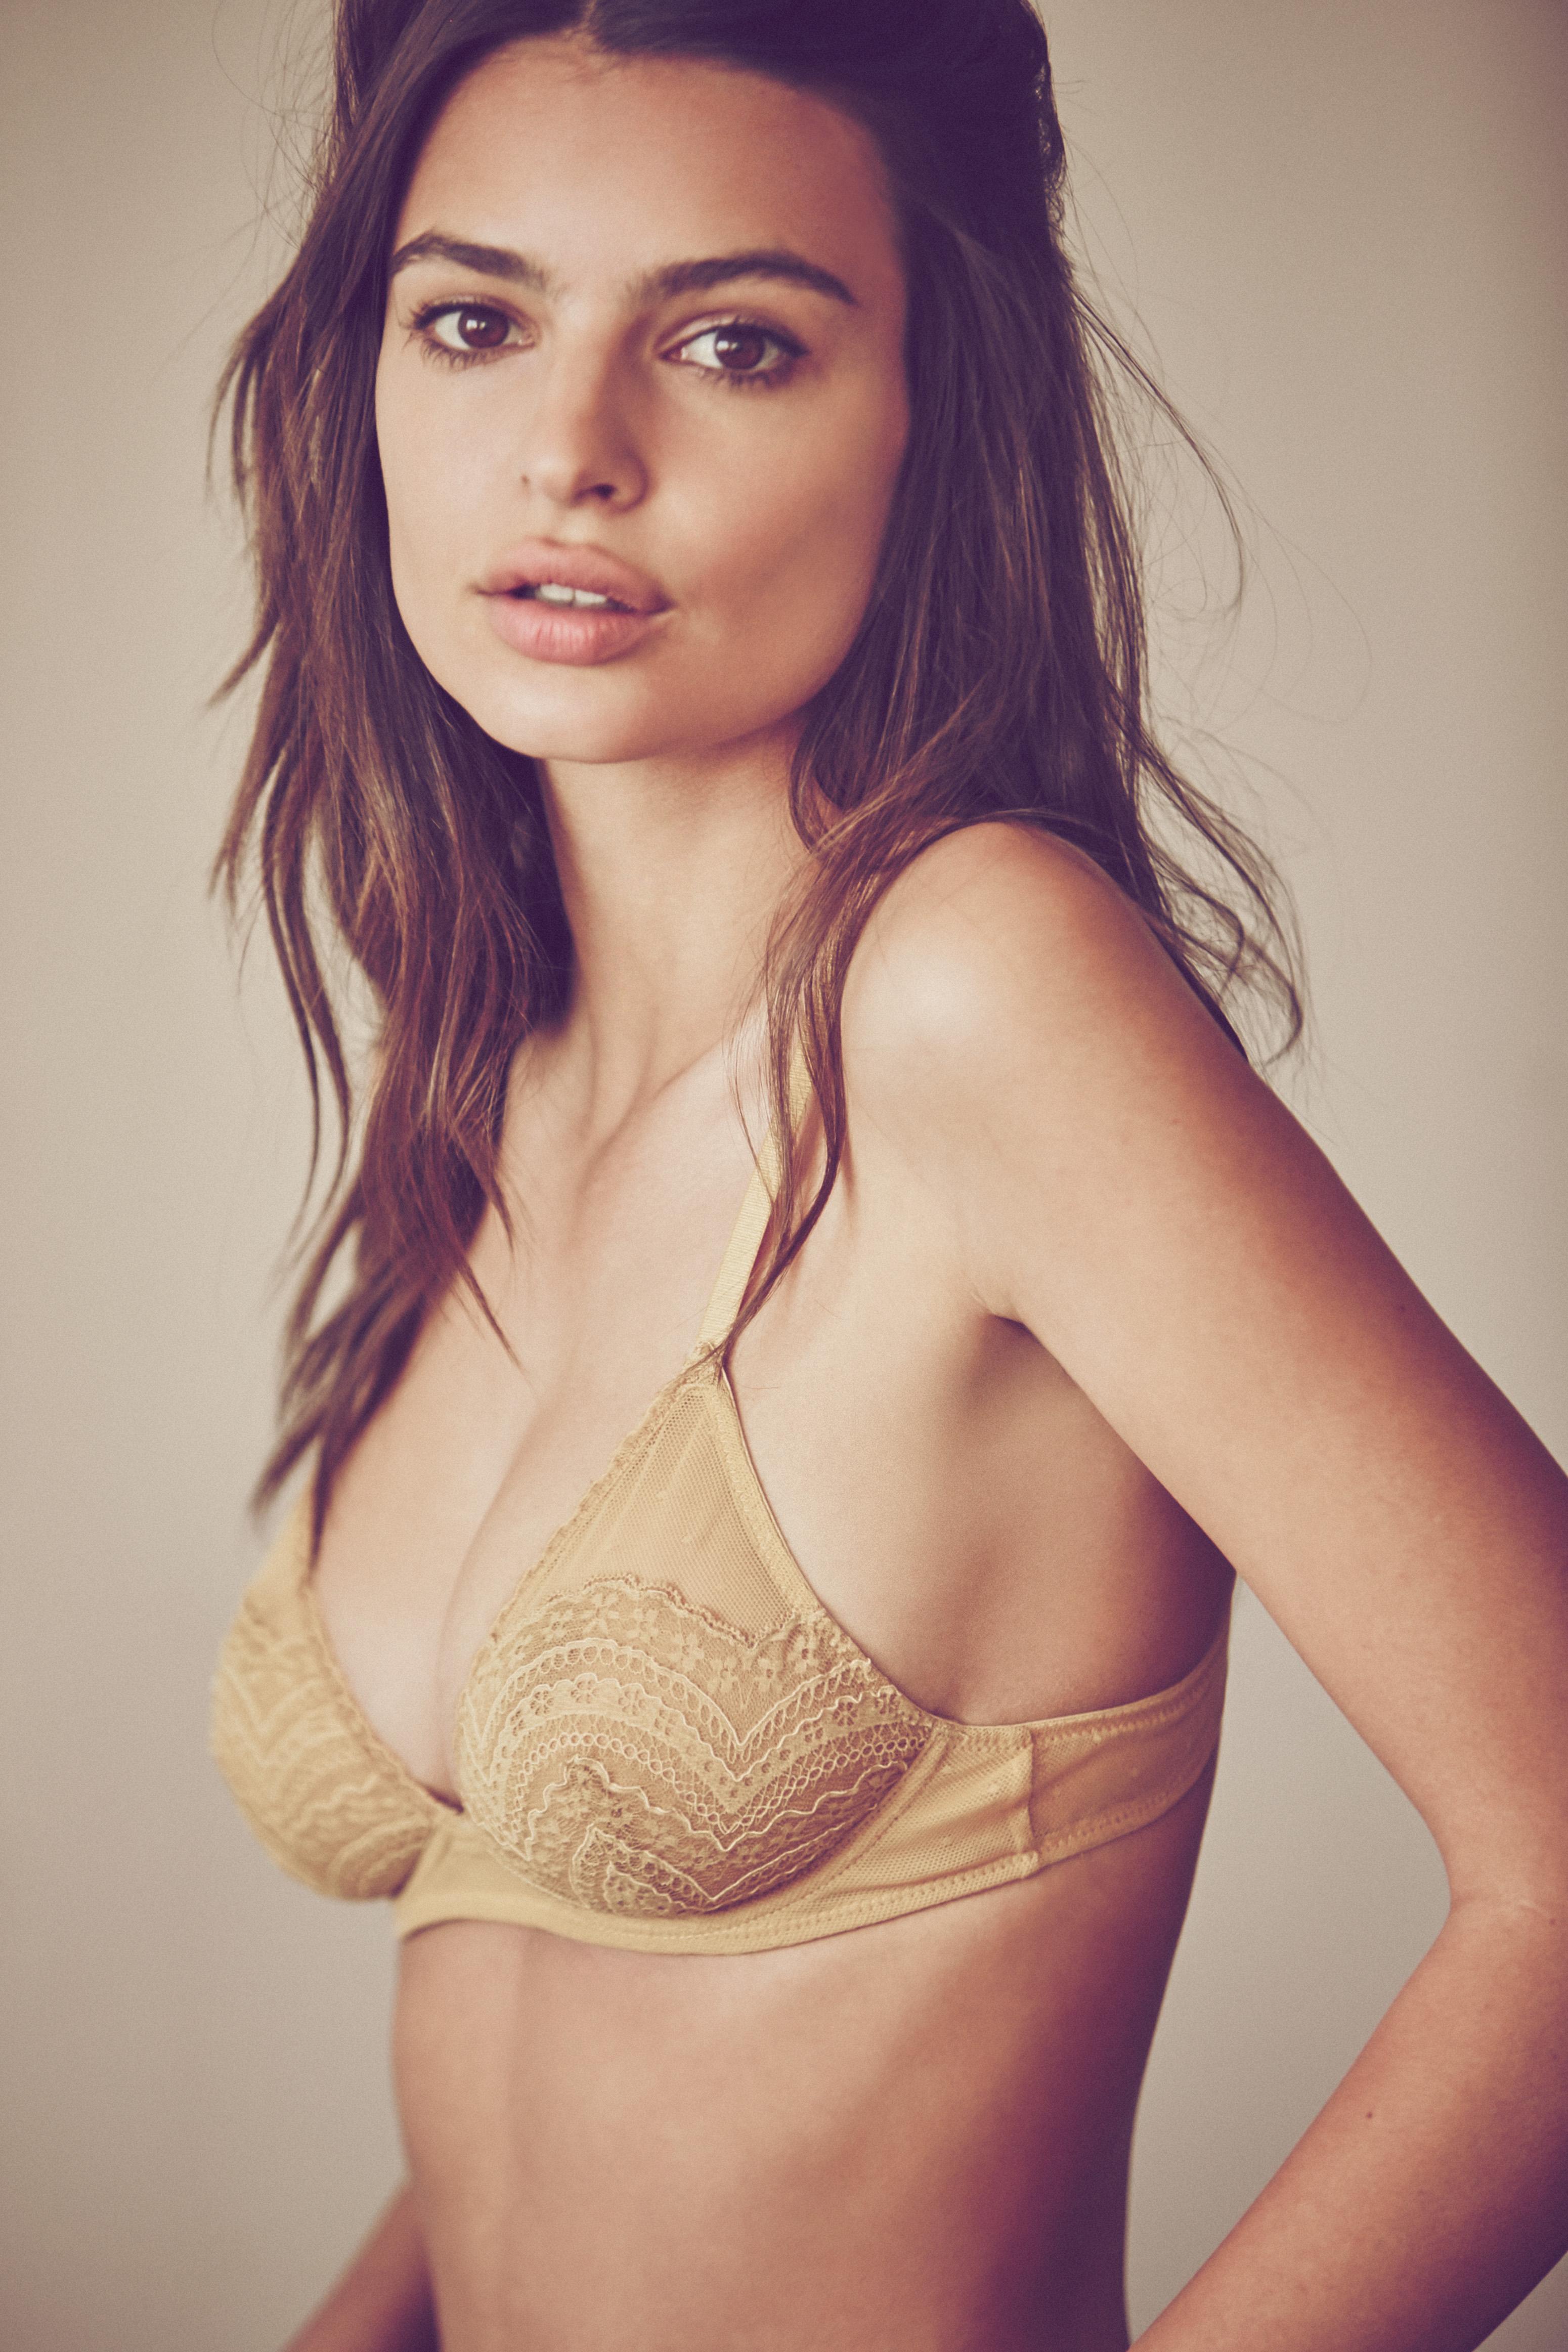 nude tasteful mature women photo